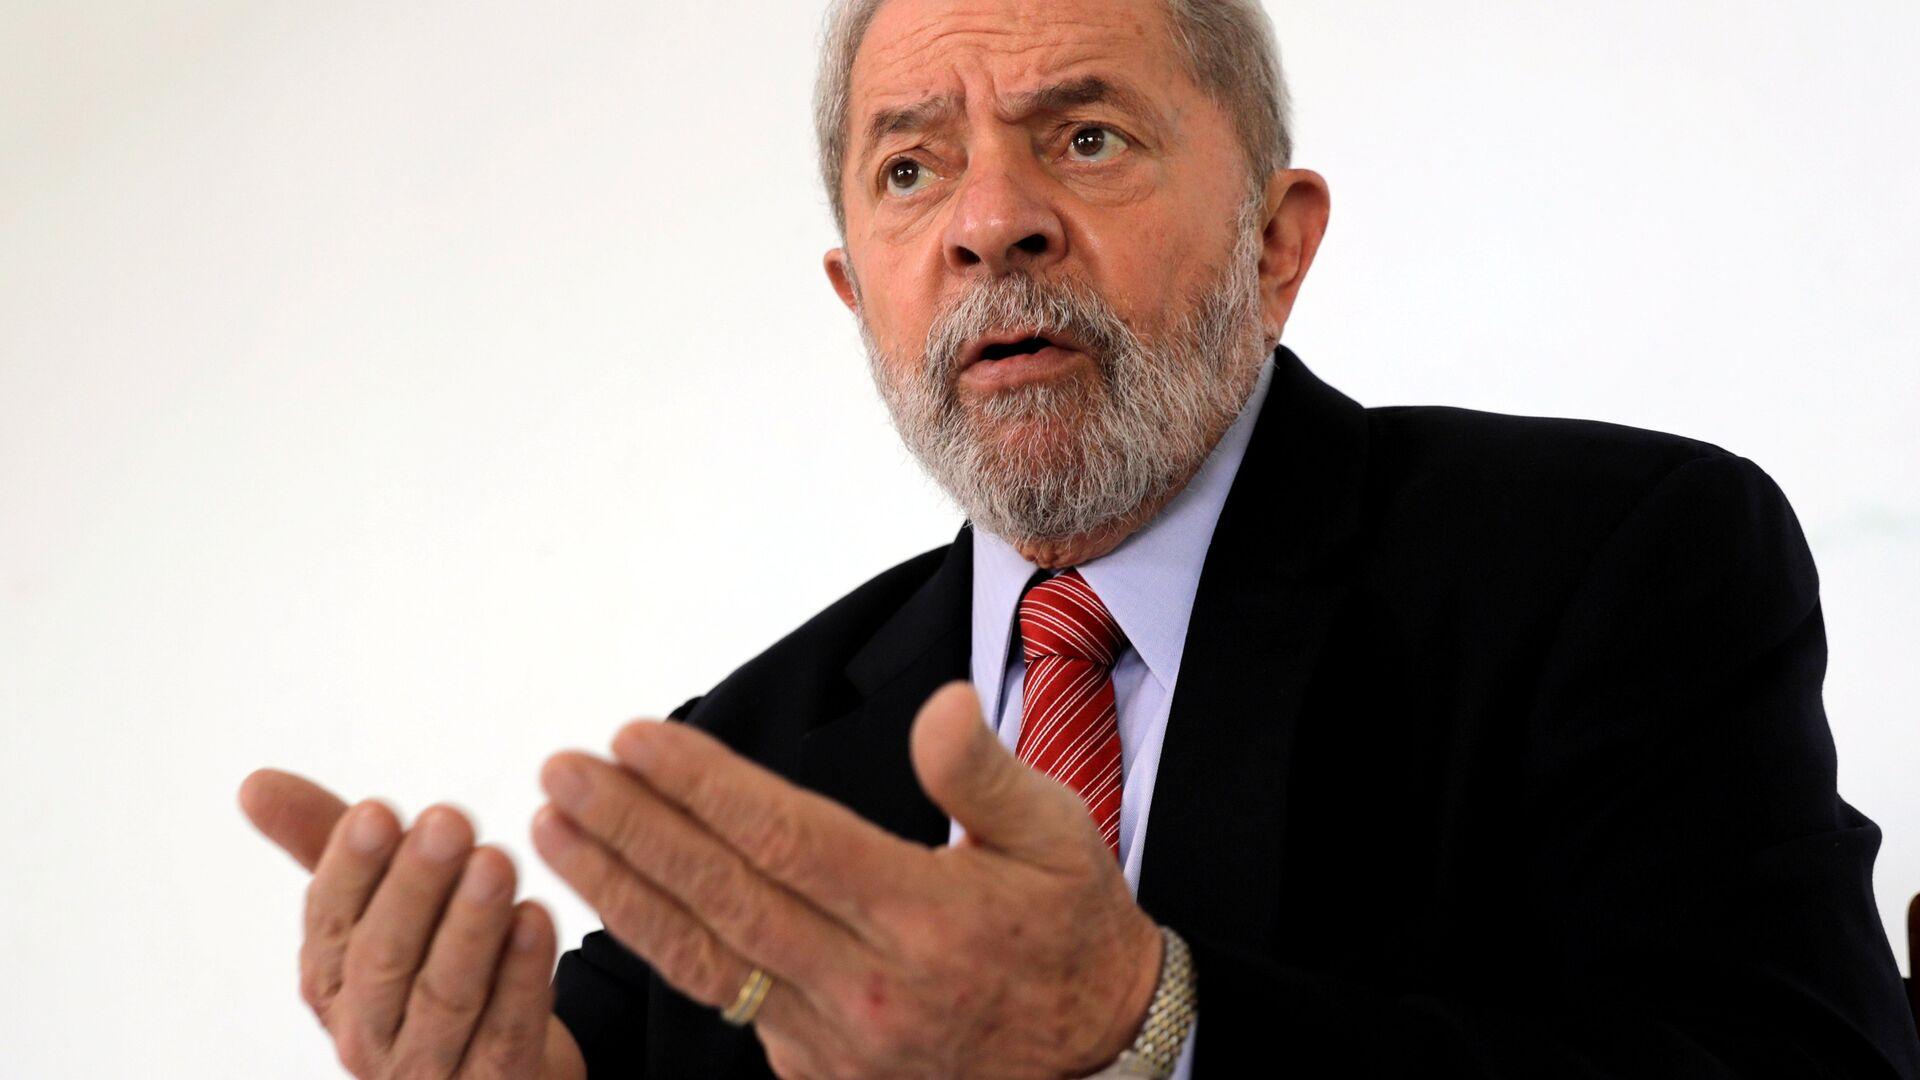 Luiz Inácio Lula da Silva, expresidente de Brasil - Sputnik Mundo, 1920, 10.03.2021